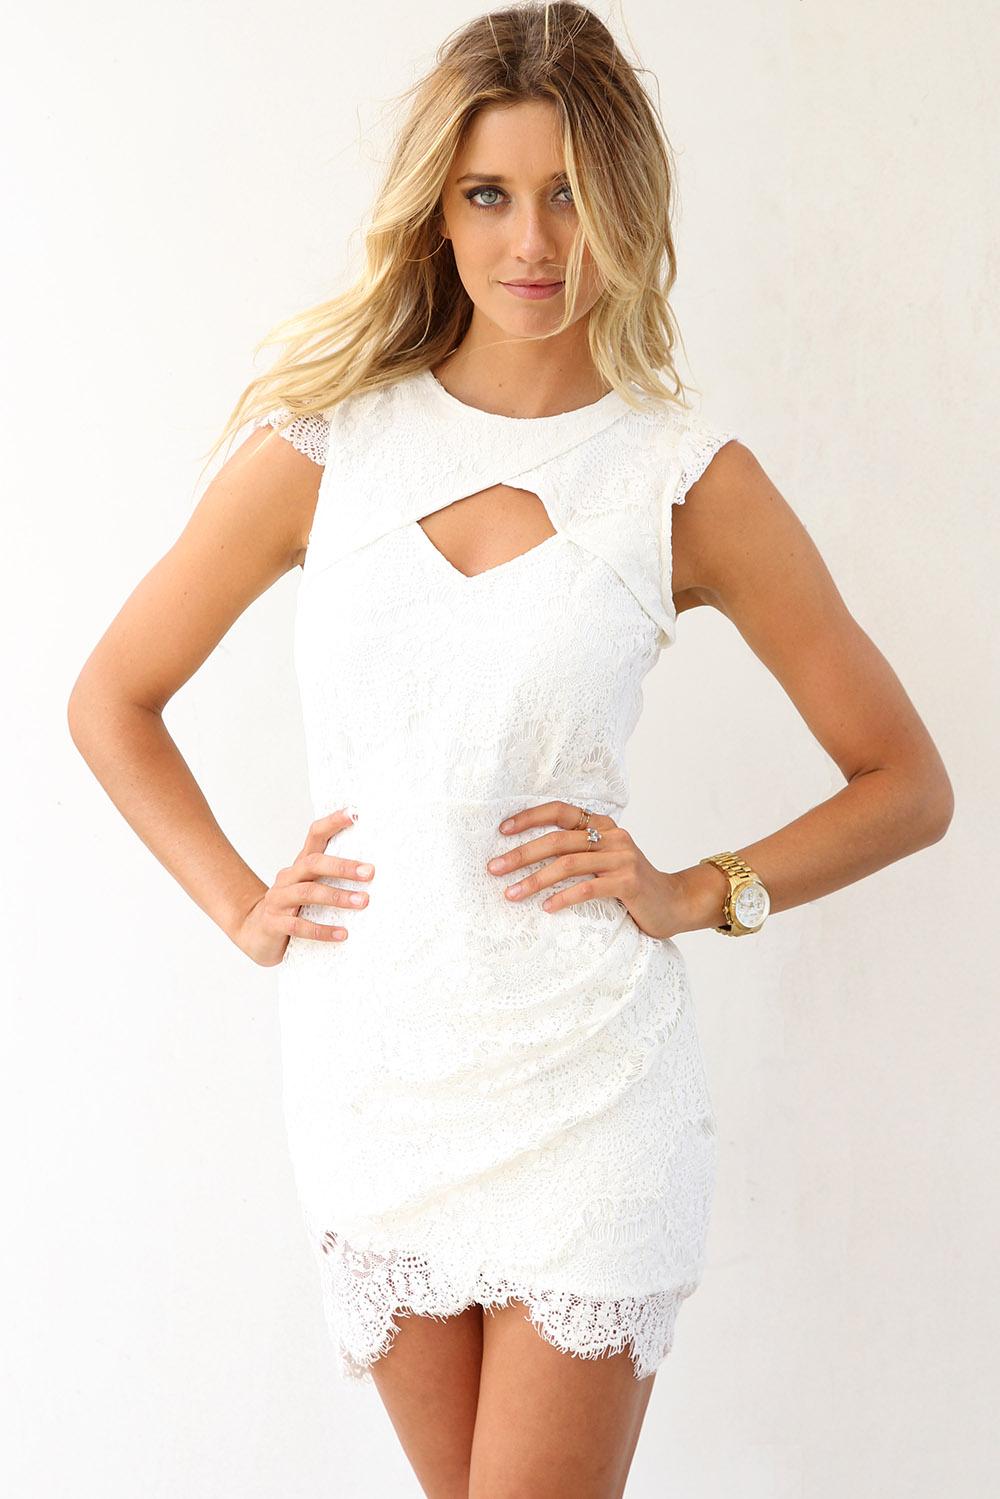 SABO SKIRT  Epiphany Lace Dress - White - White - 58.0000